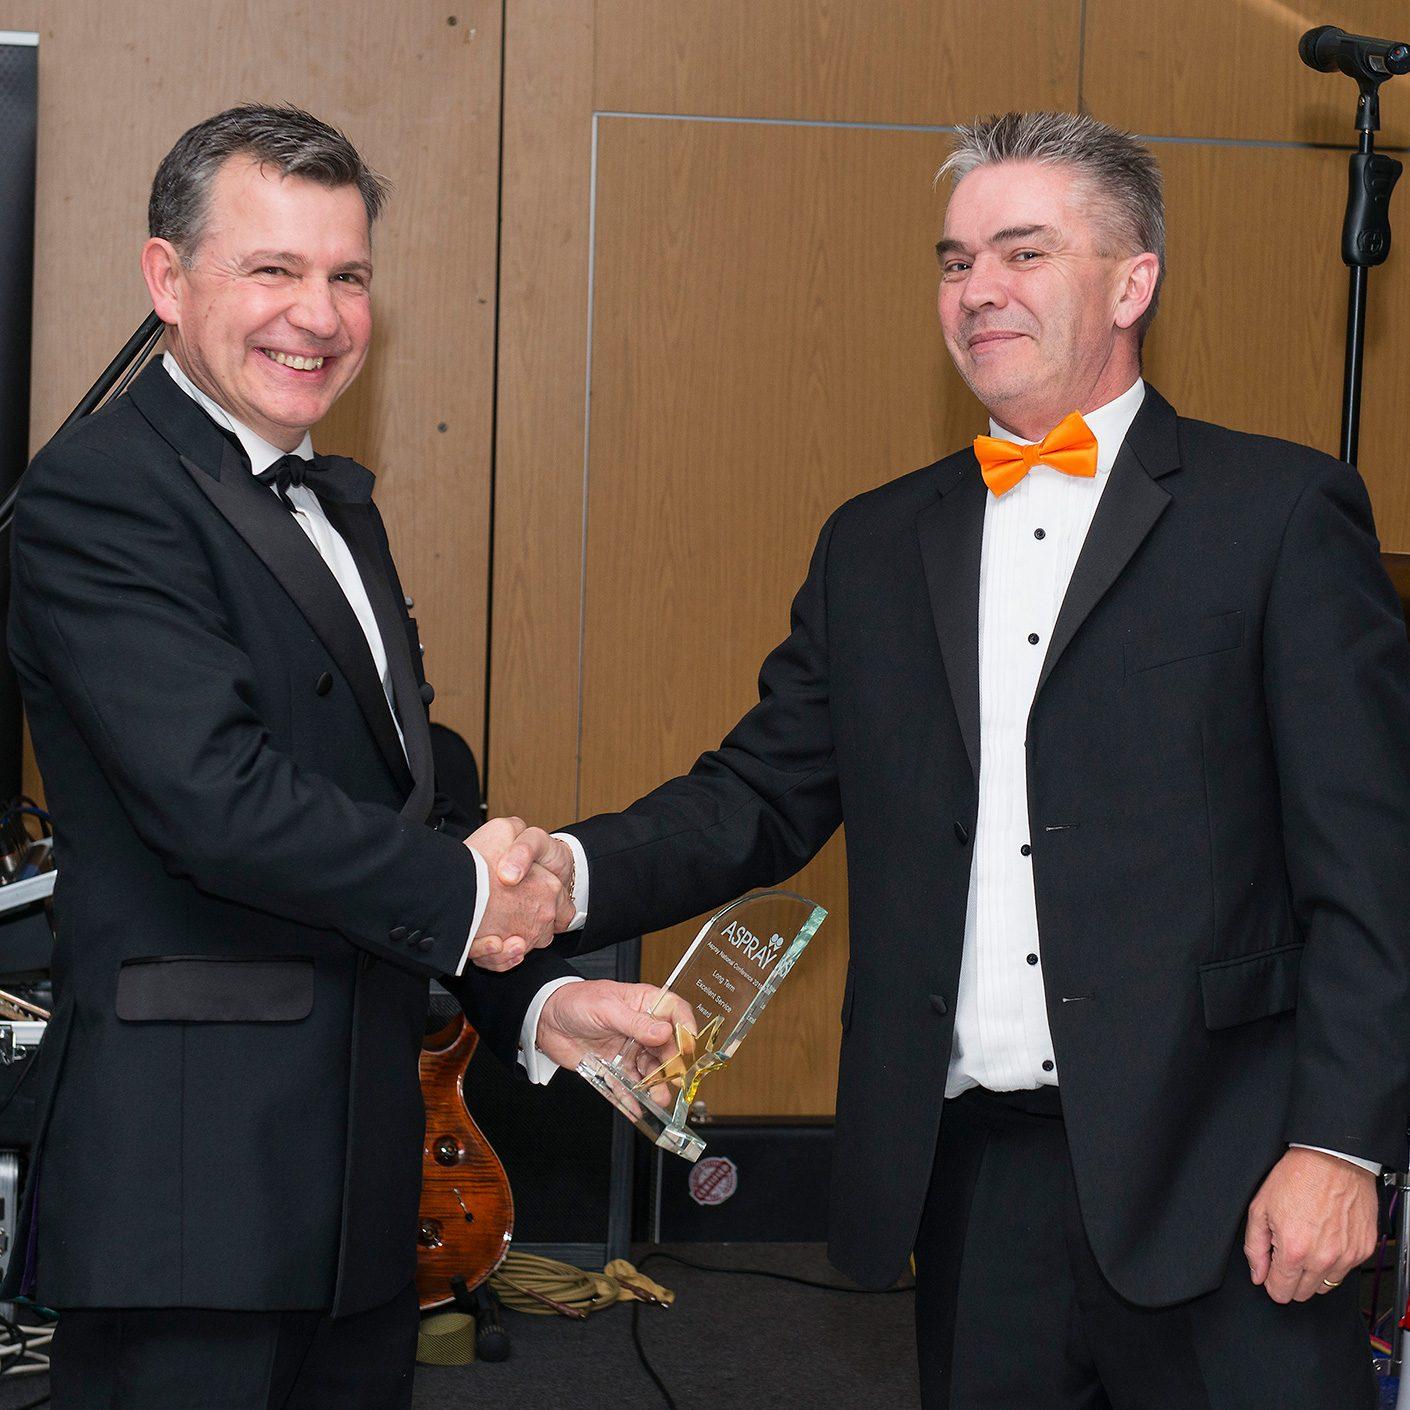 Clive Hawkesley, Award Winner